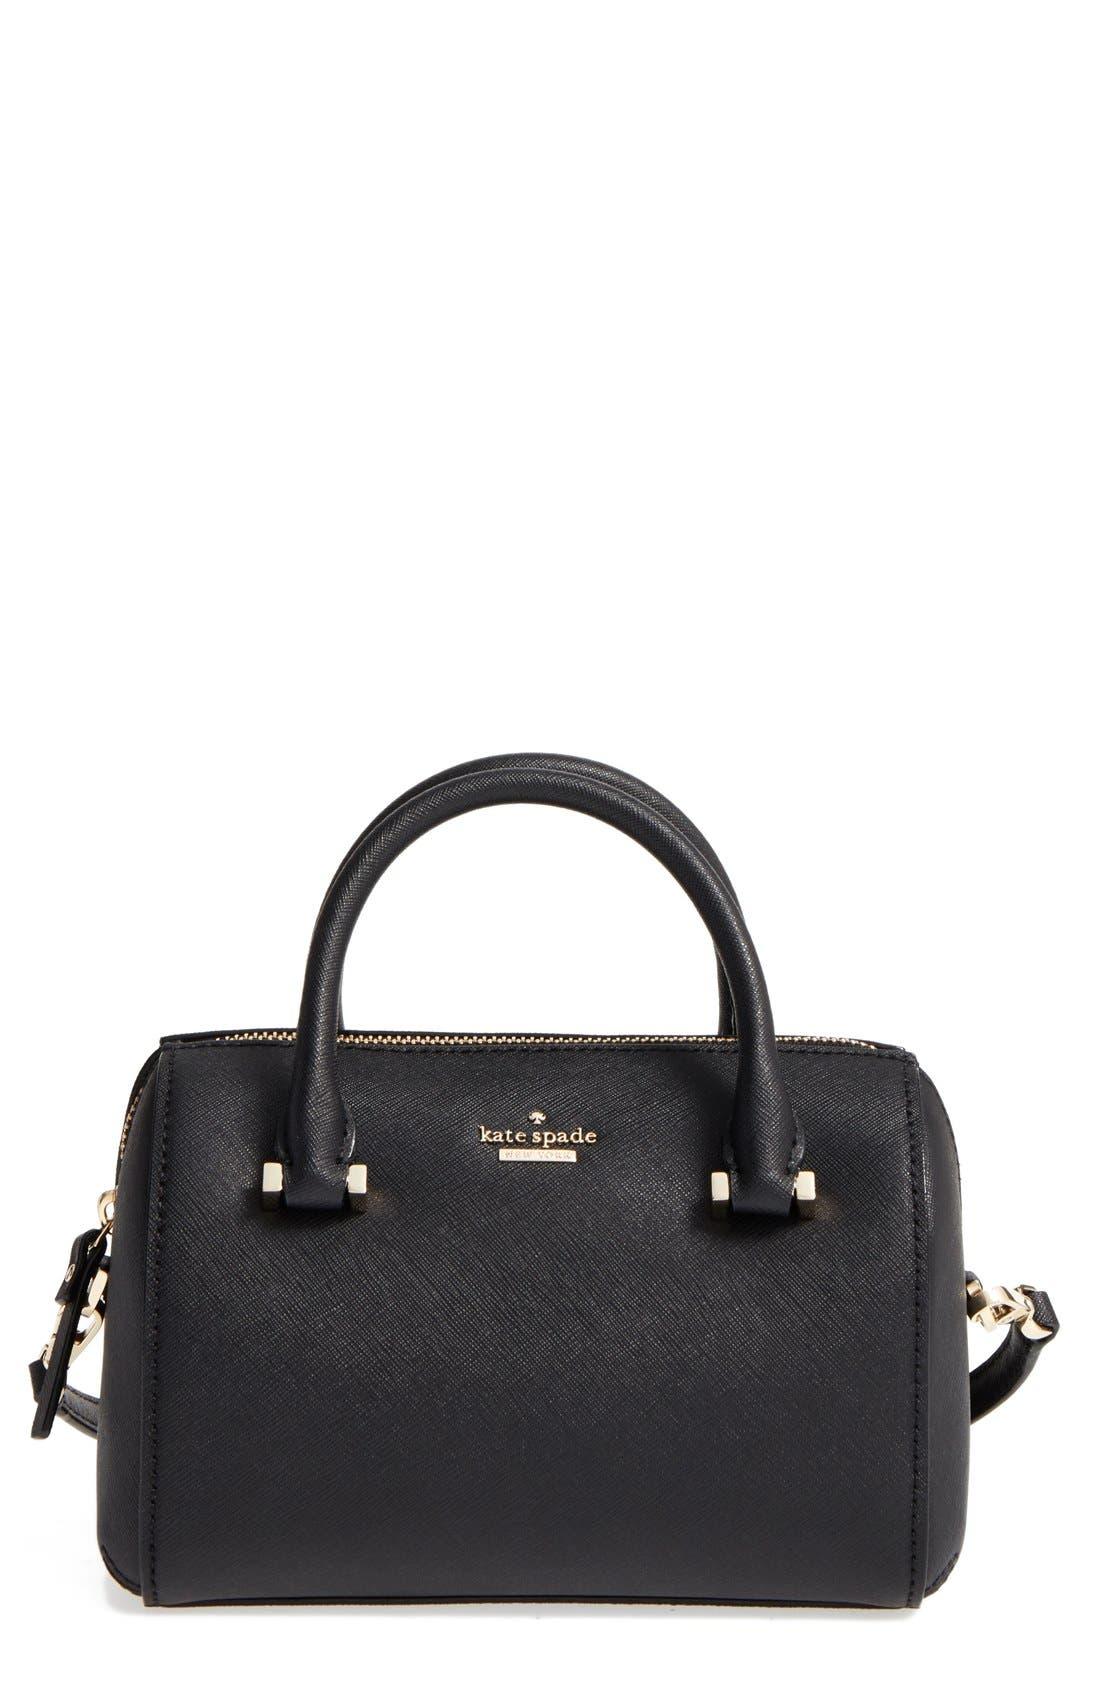 cameron street lane leather satchel, Main, color, 001